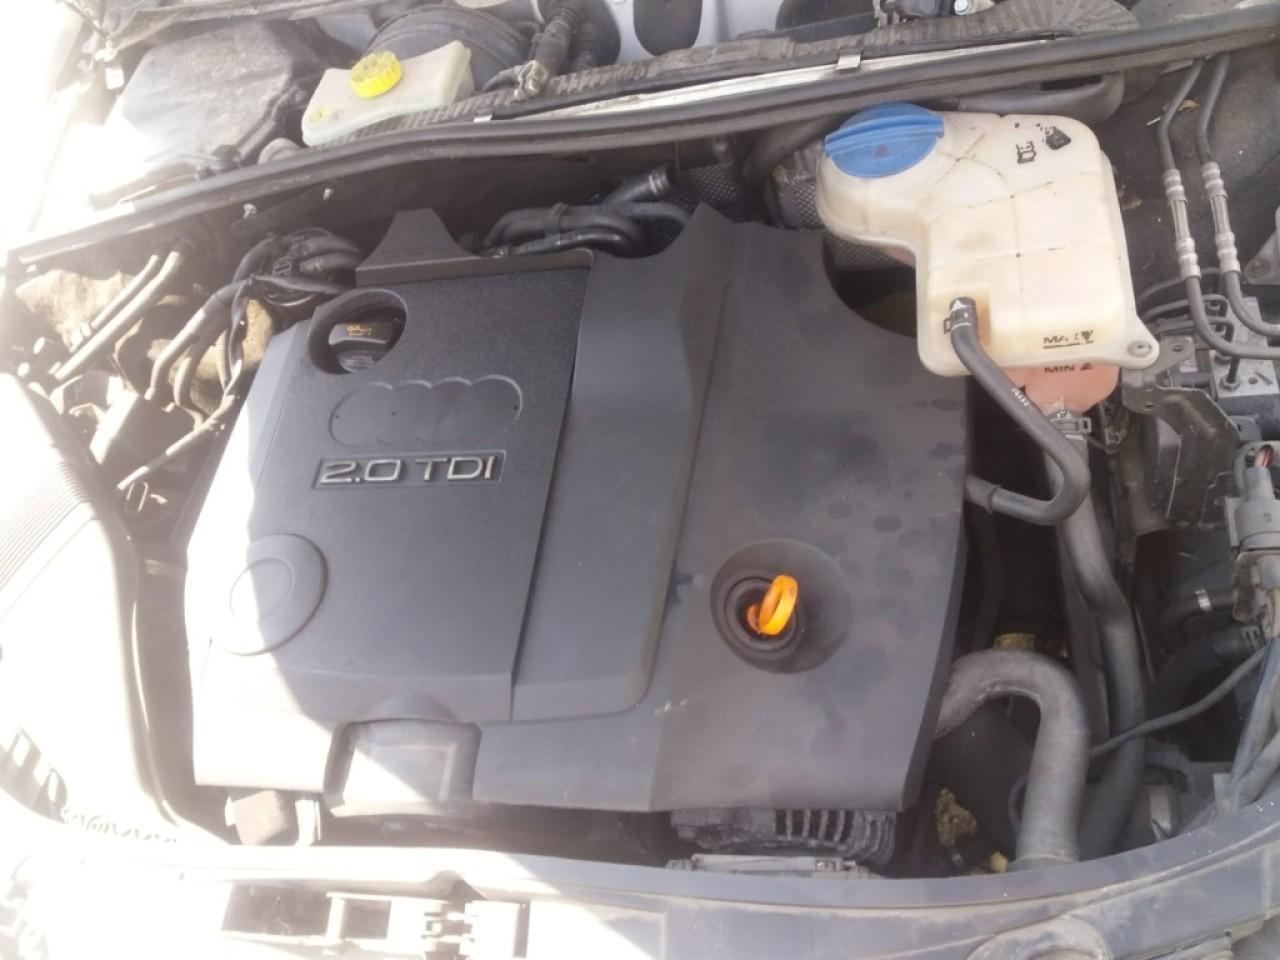 Arc stanga spate, Audi A4 B7 2.0 tdi 2005